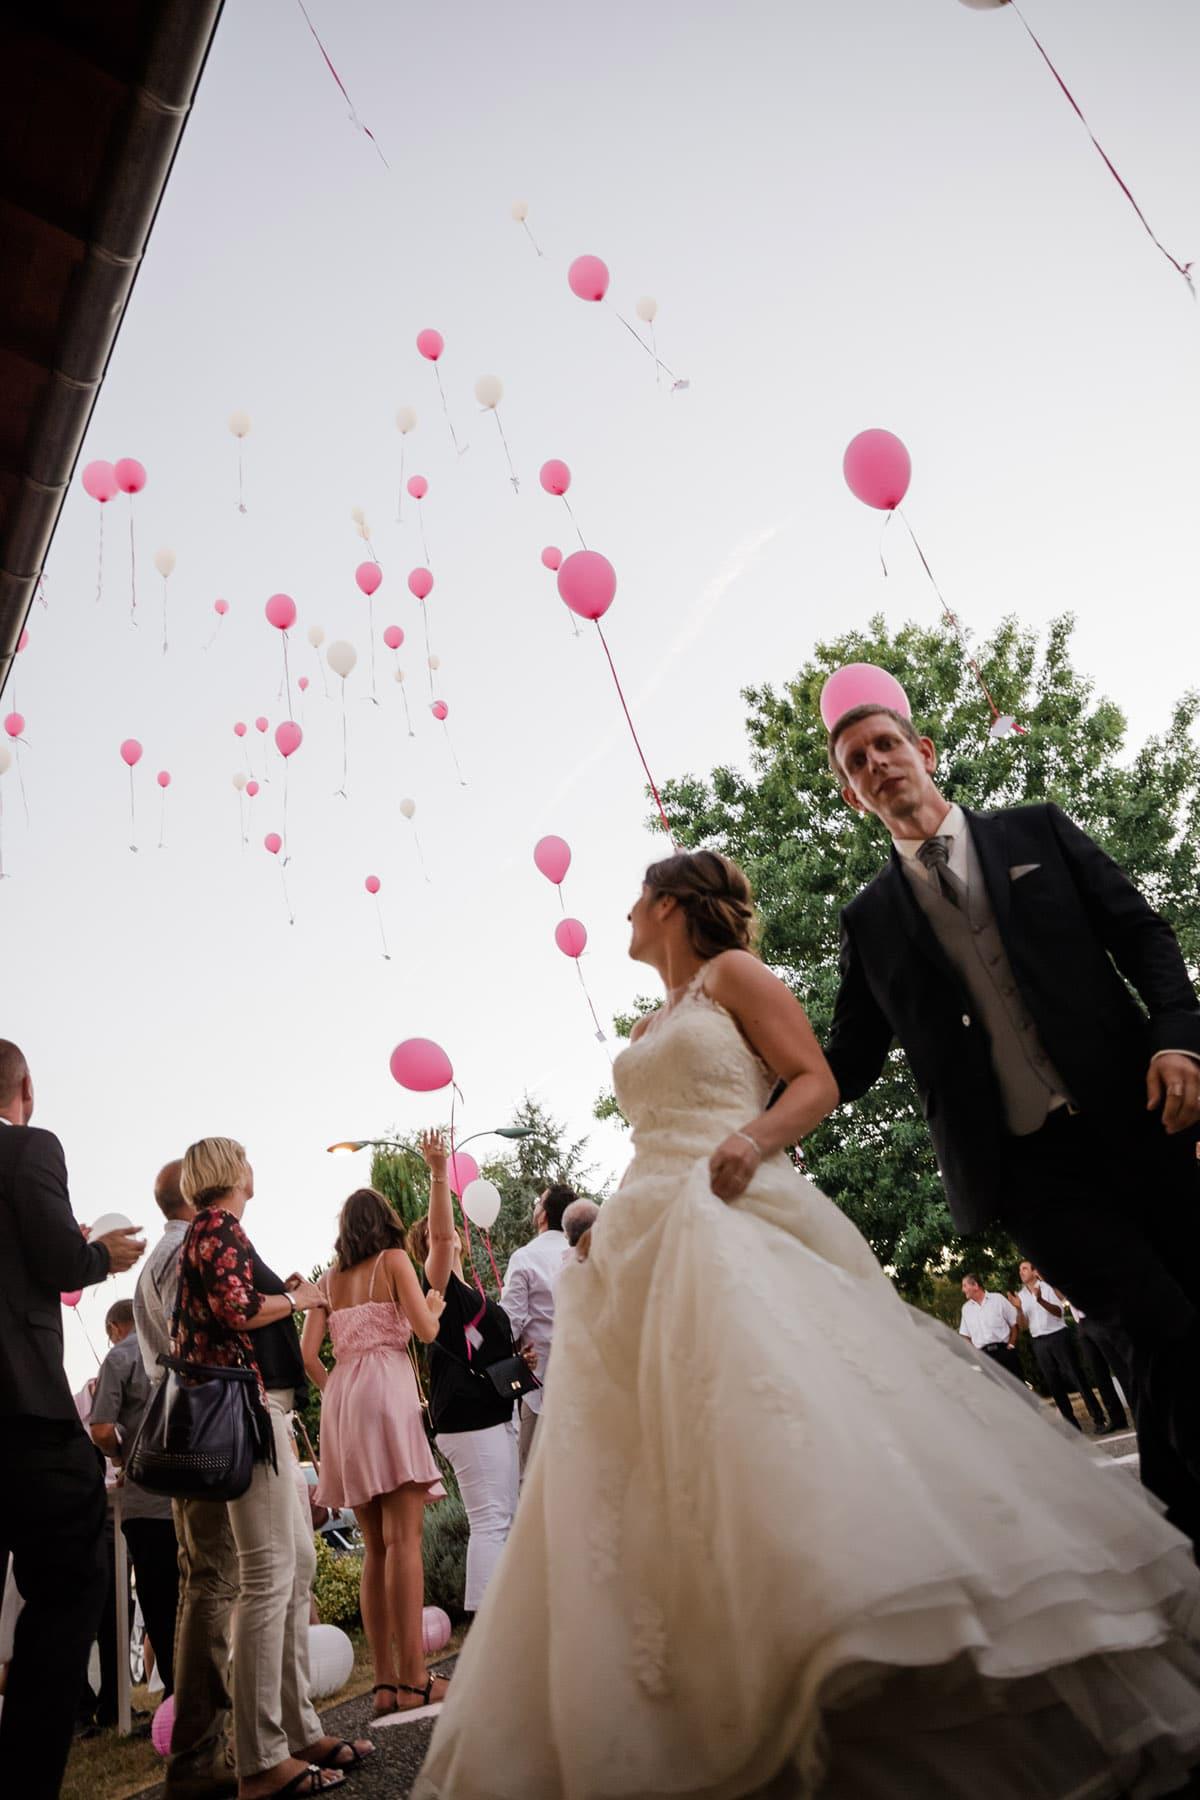 photographe mariage bordeaux landes fineart francais sarah miramon blog 45